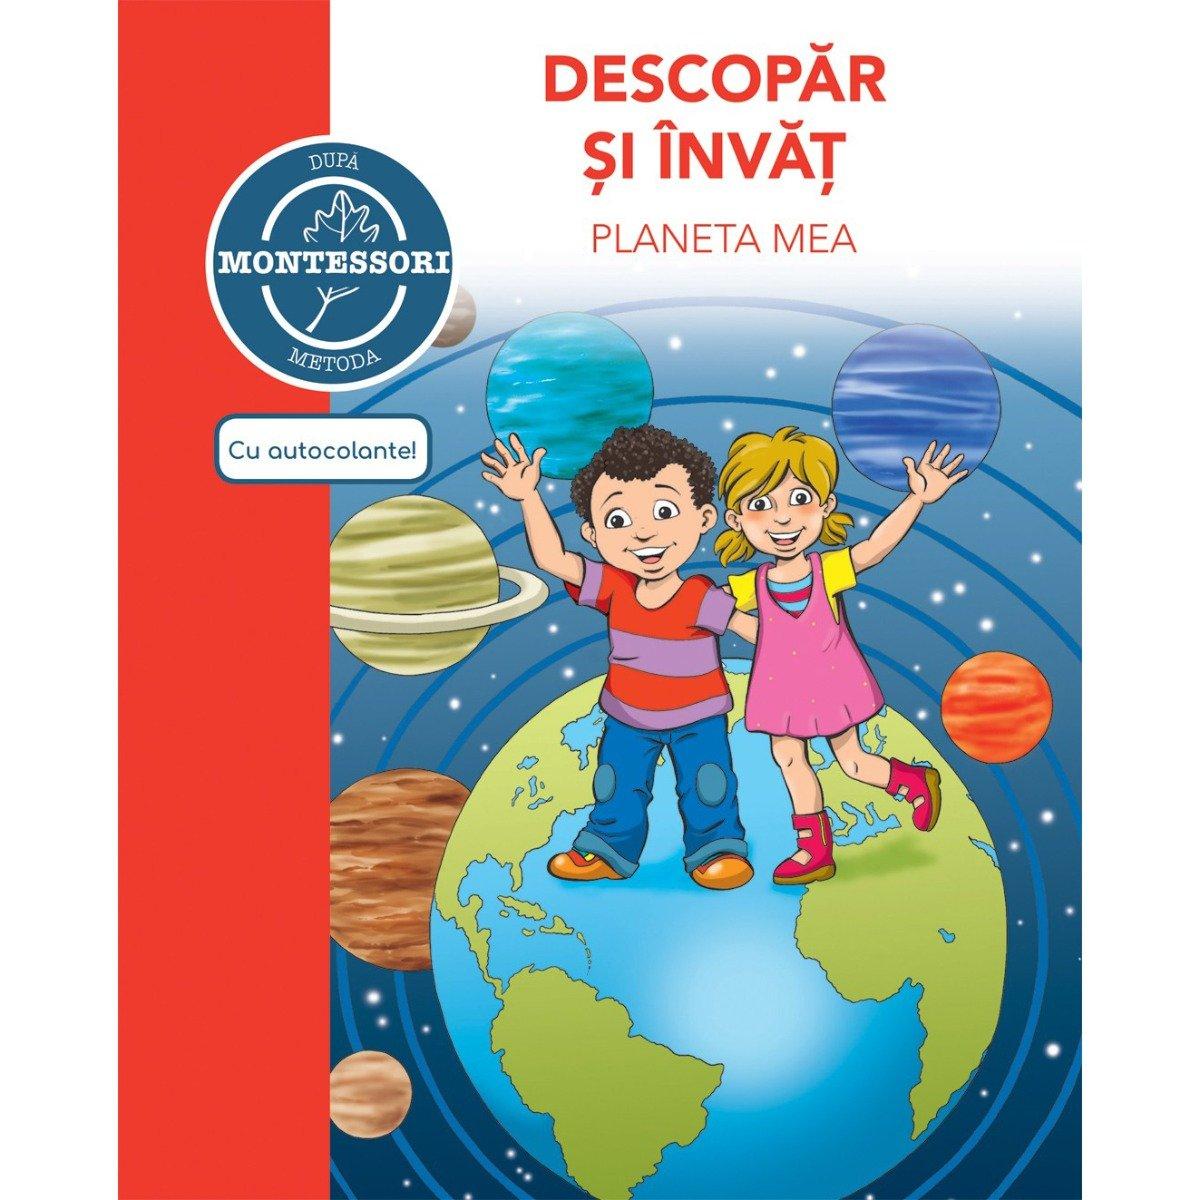 Carte Descopar si invat planeta mea - dupa metoda Montessori, Editura DPH imagine 2021